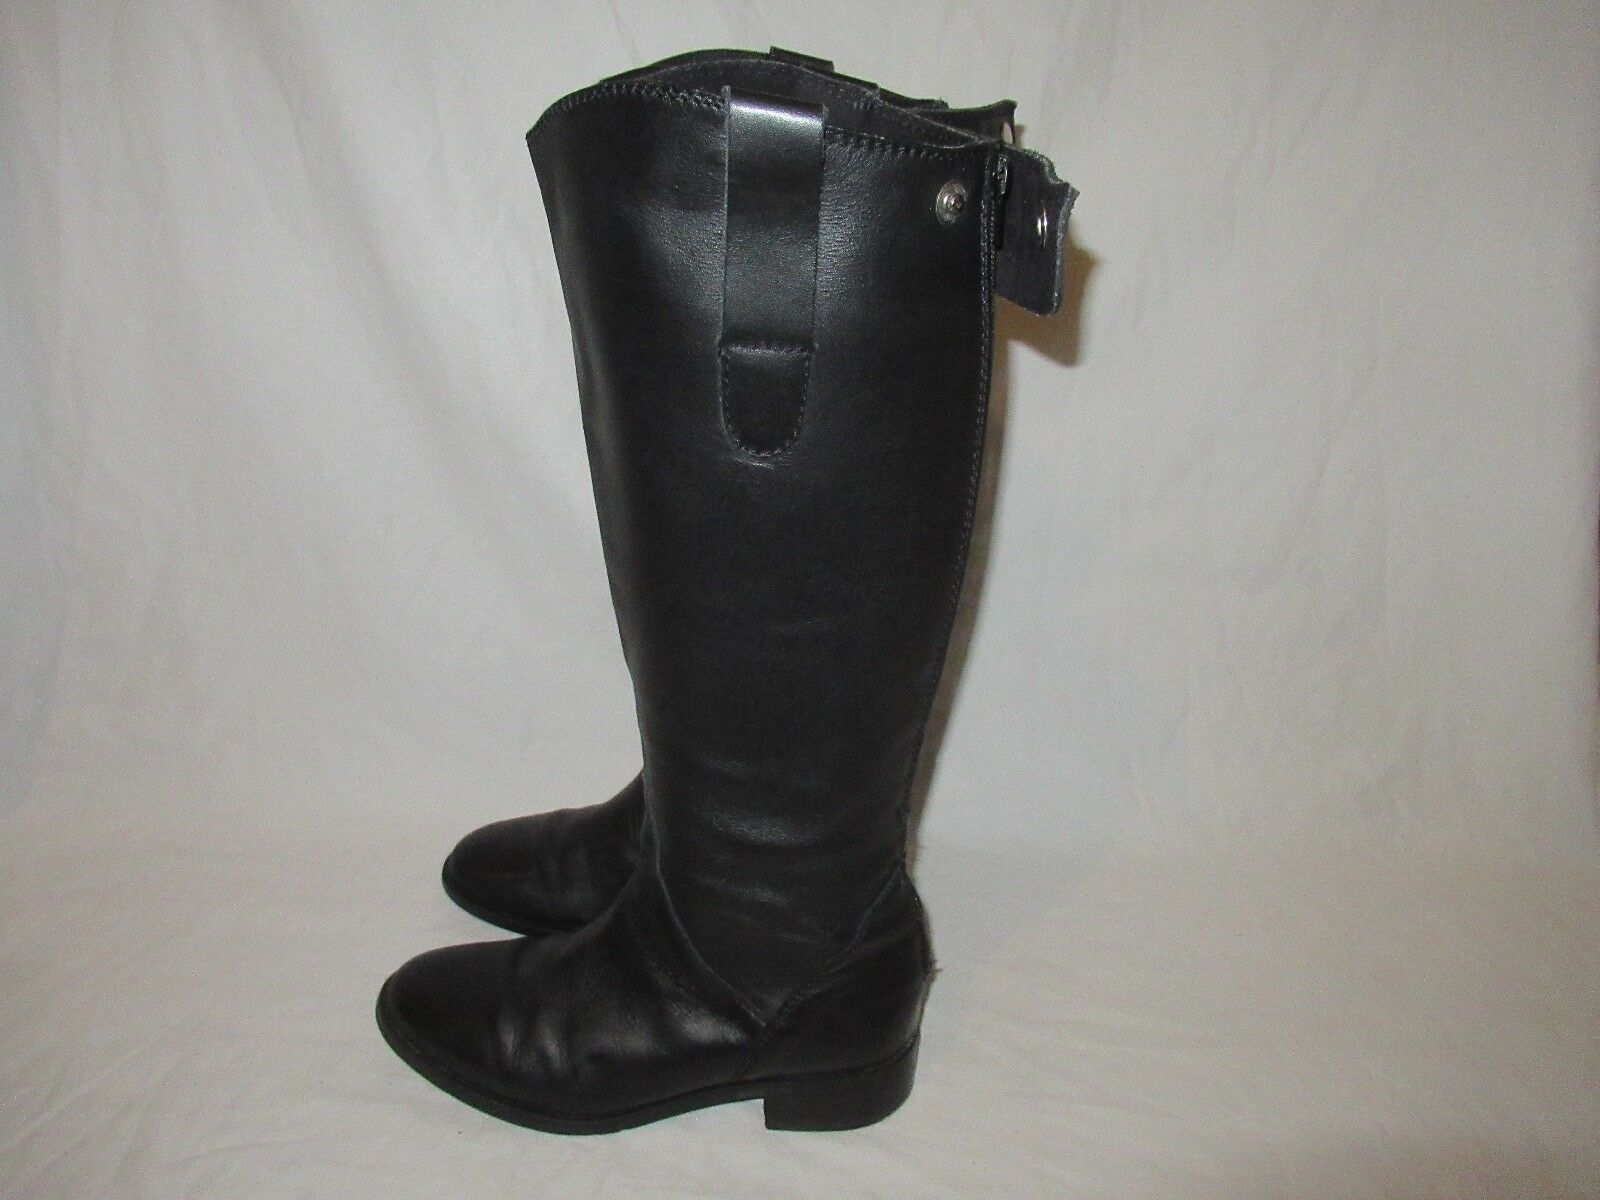 STEVE MADDEN BLACK LEATHER RIDING Knee High Fashion BOOTS Größe Damenschuhe 8 M